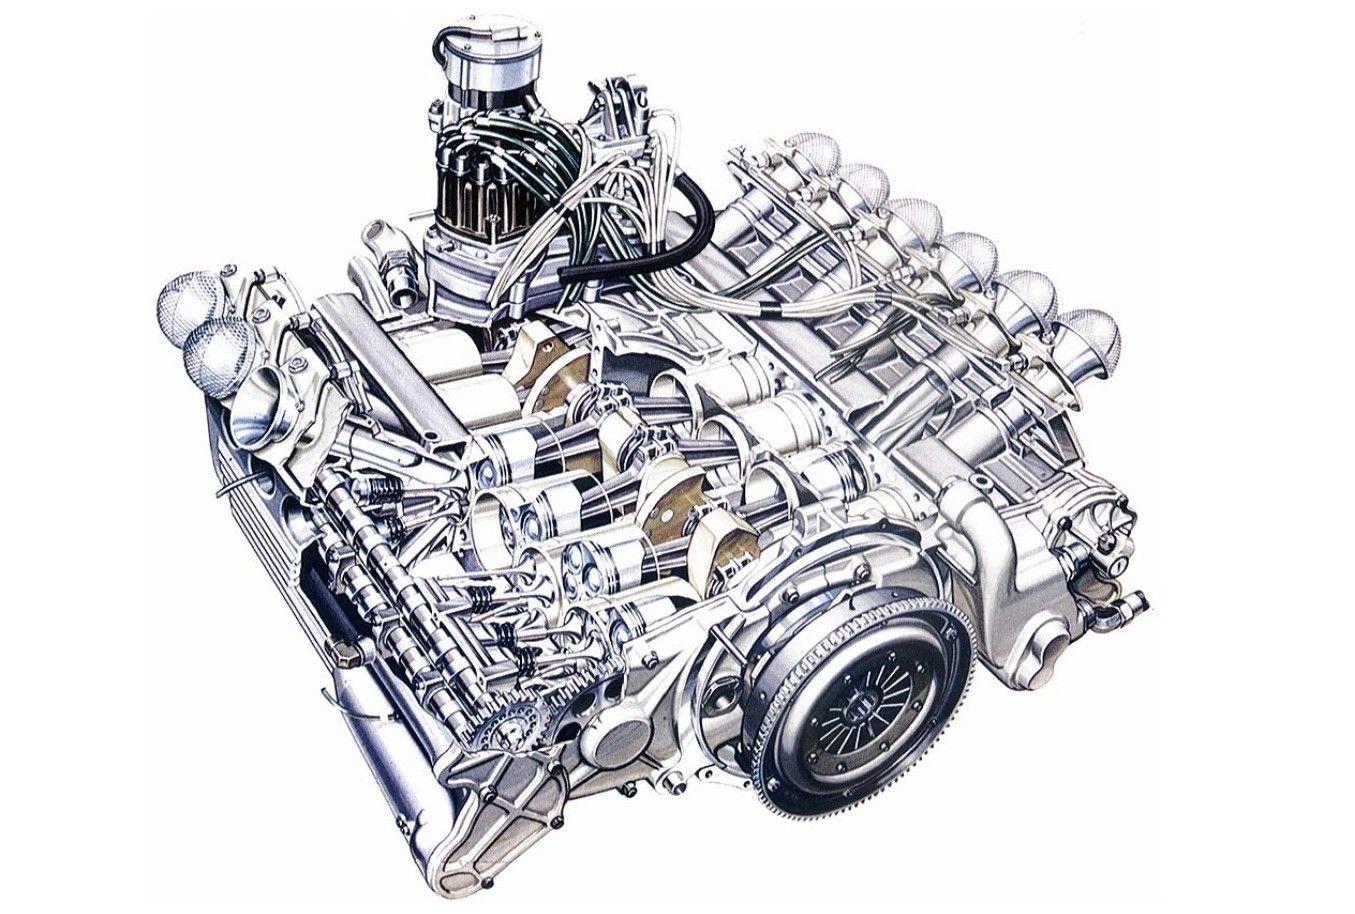 Ferrari Boxer Engine Diagram - Piping Line Diagram Symbols -  valkyrie.tukune.jeanjaures37.frWiring Diagram Resource